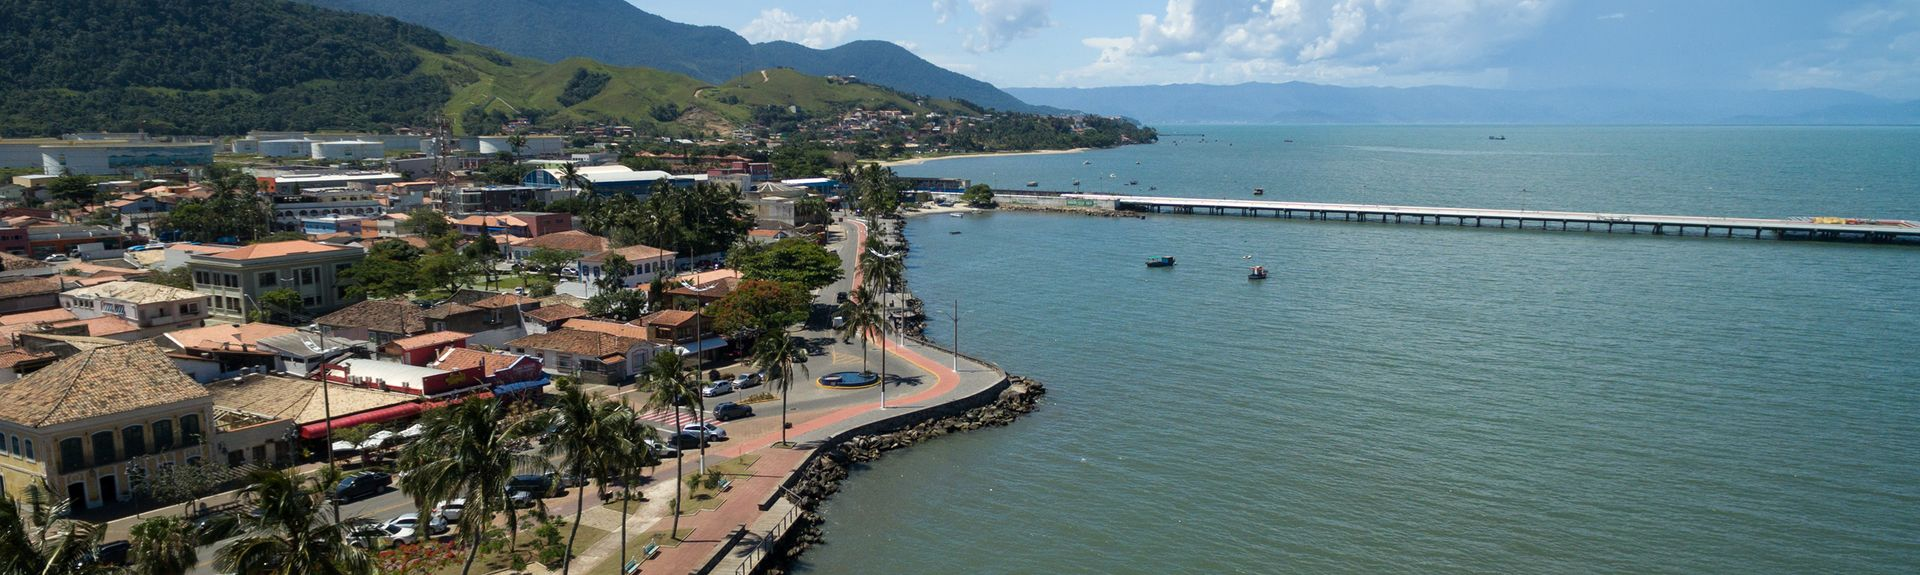 Sao Sebastiao, Southeast Region, Brazil